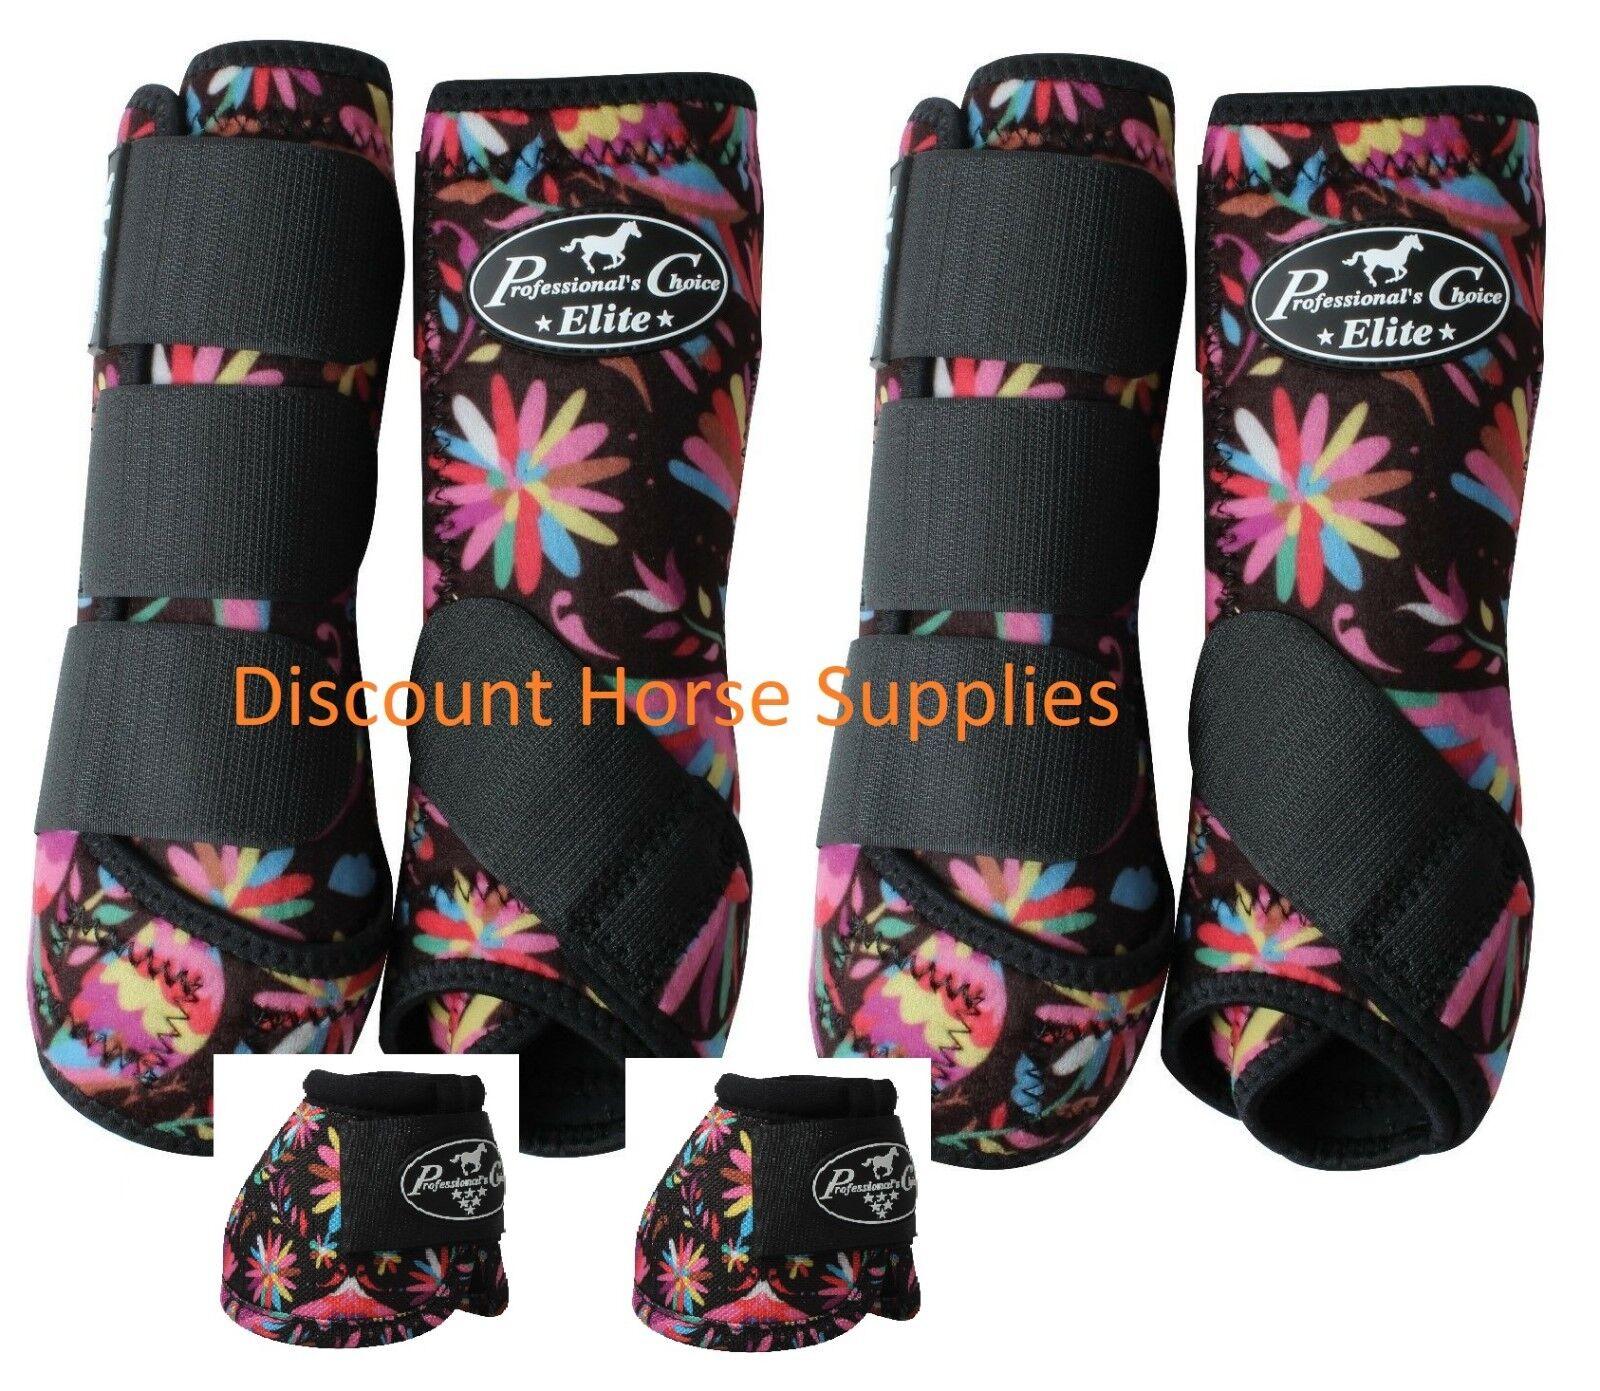 Professional's Choice Ventech Elite valor 4 Pack botas Fiesta con campanas M Pro Med